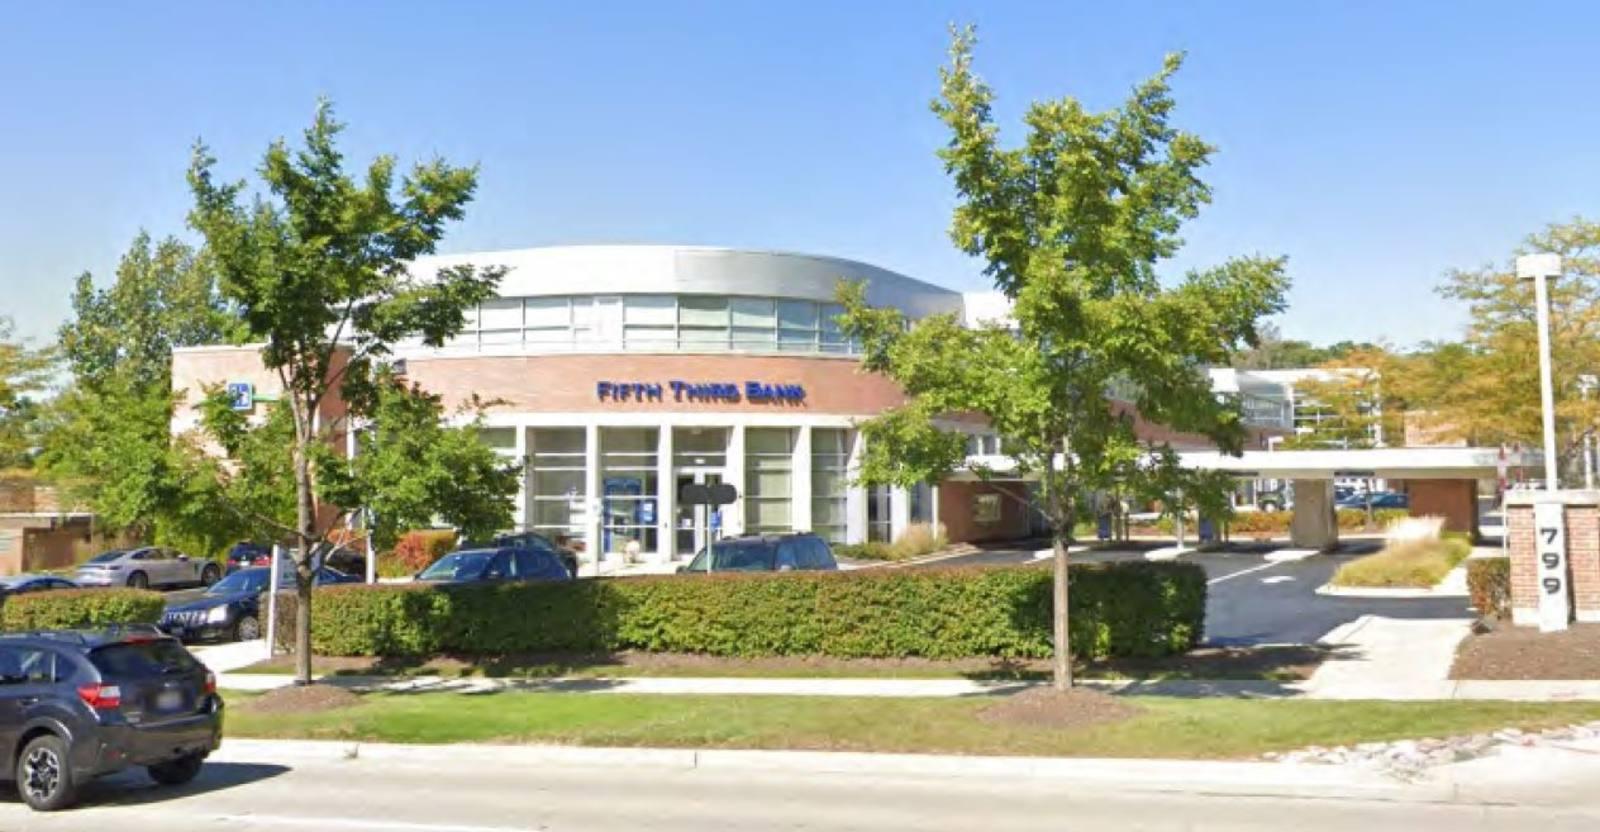 CBRE Retail799 Central Avenue799 Central Ave.  Photo